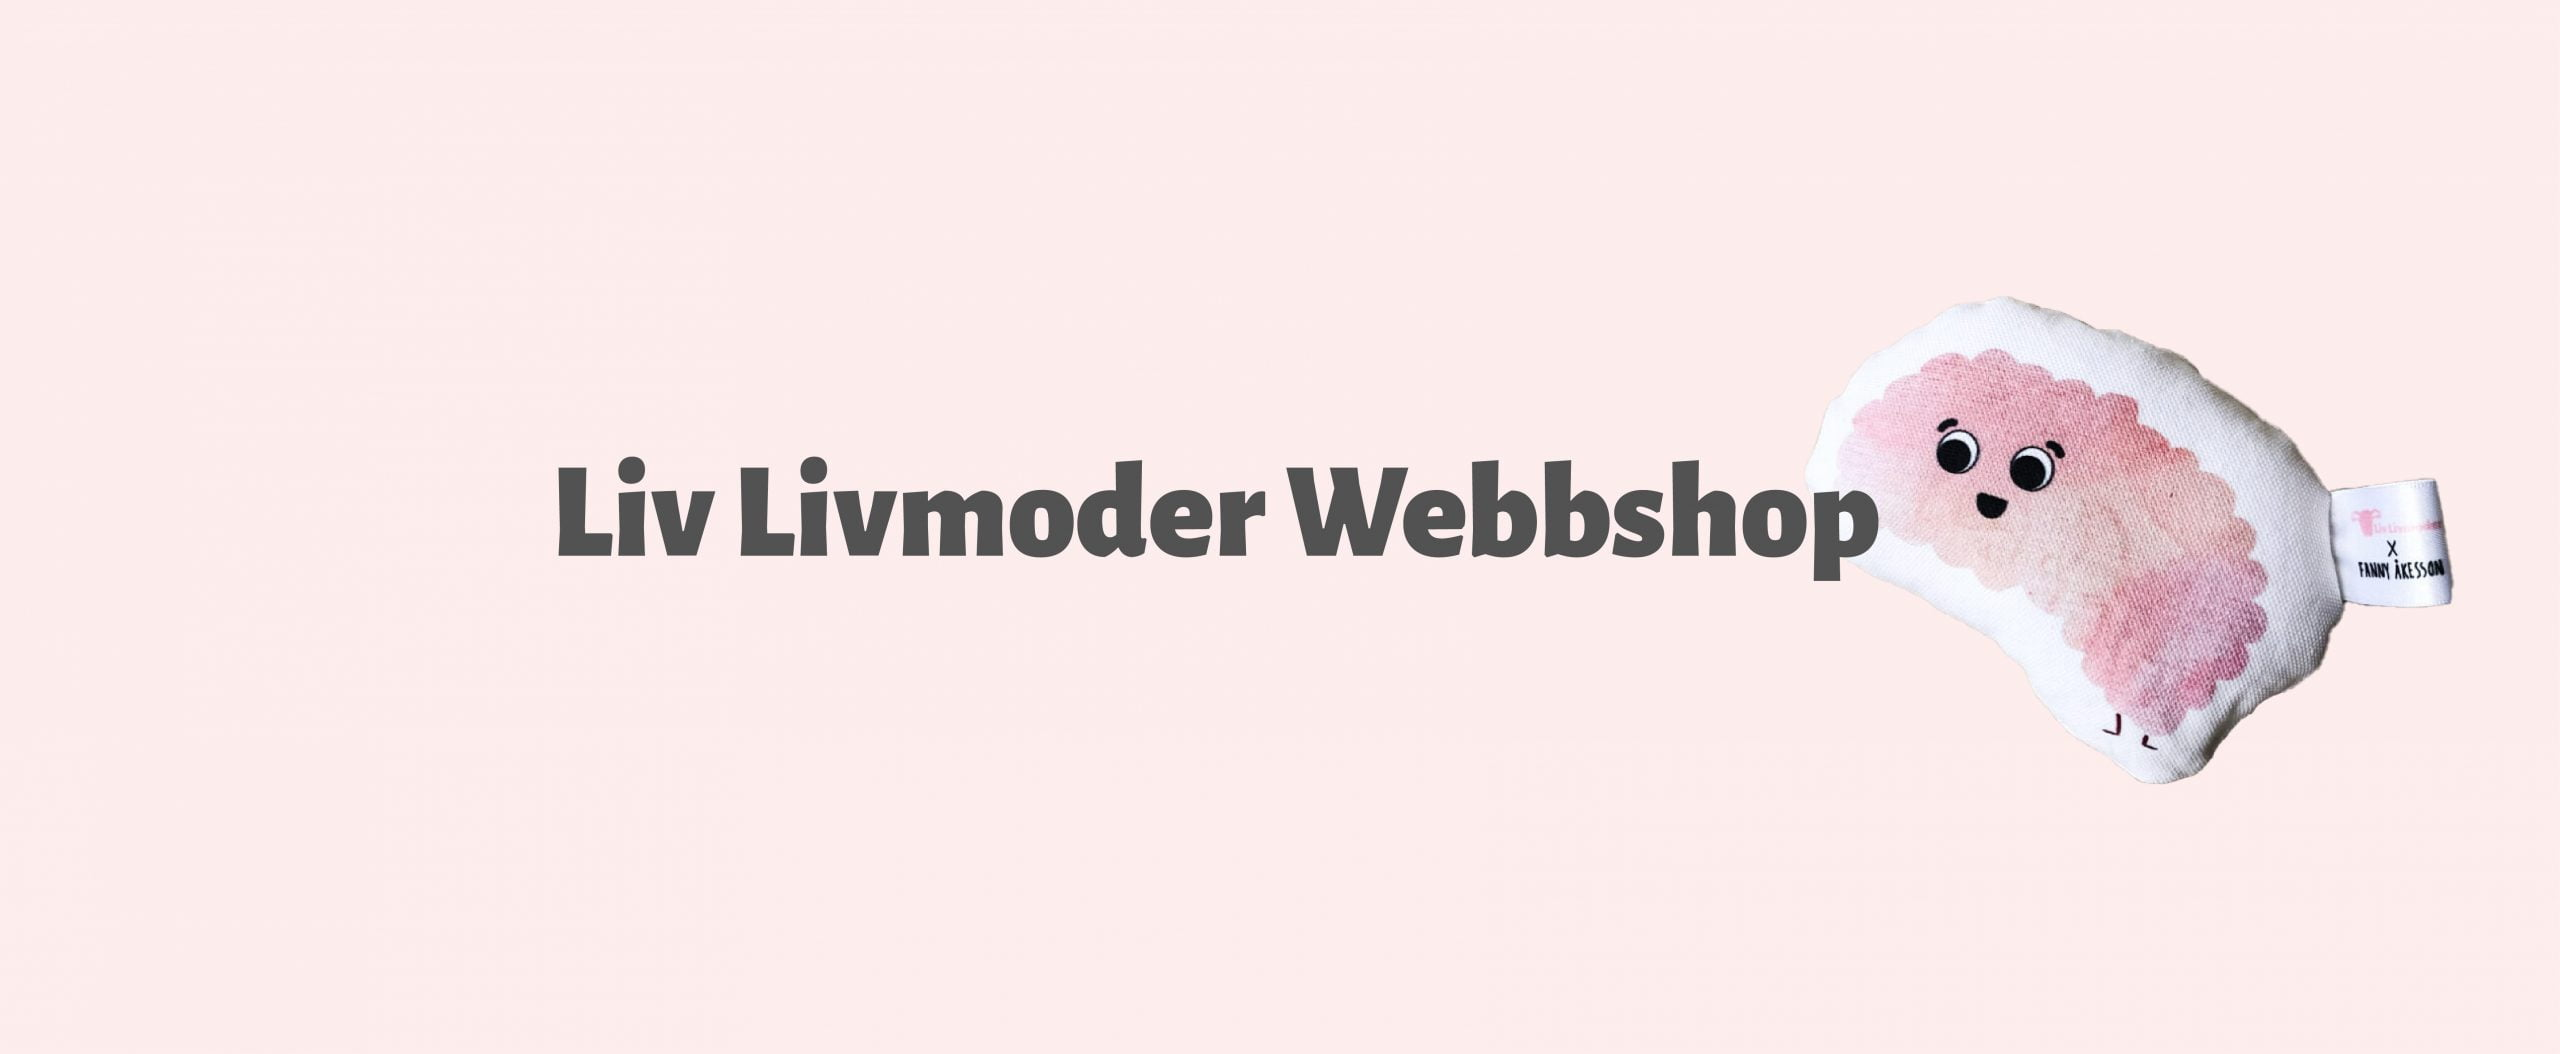 Liv Livmoder Webbshop Banner